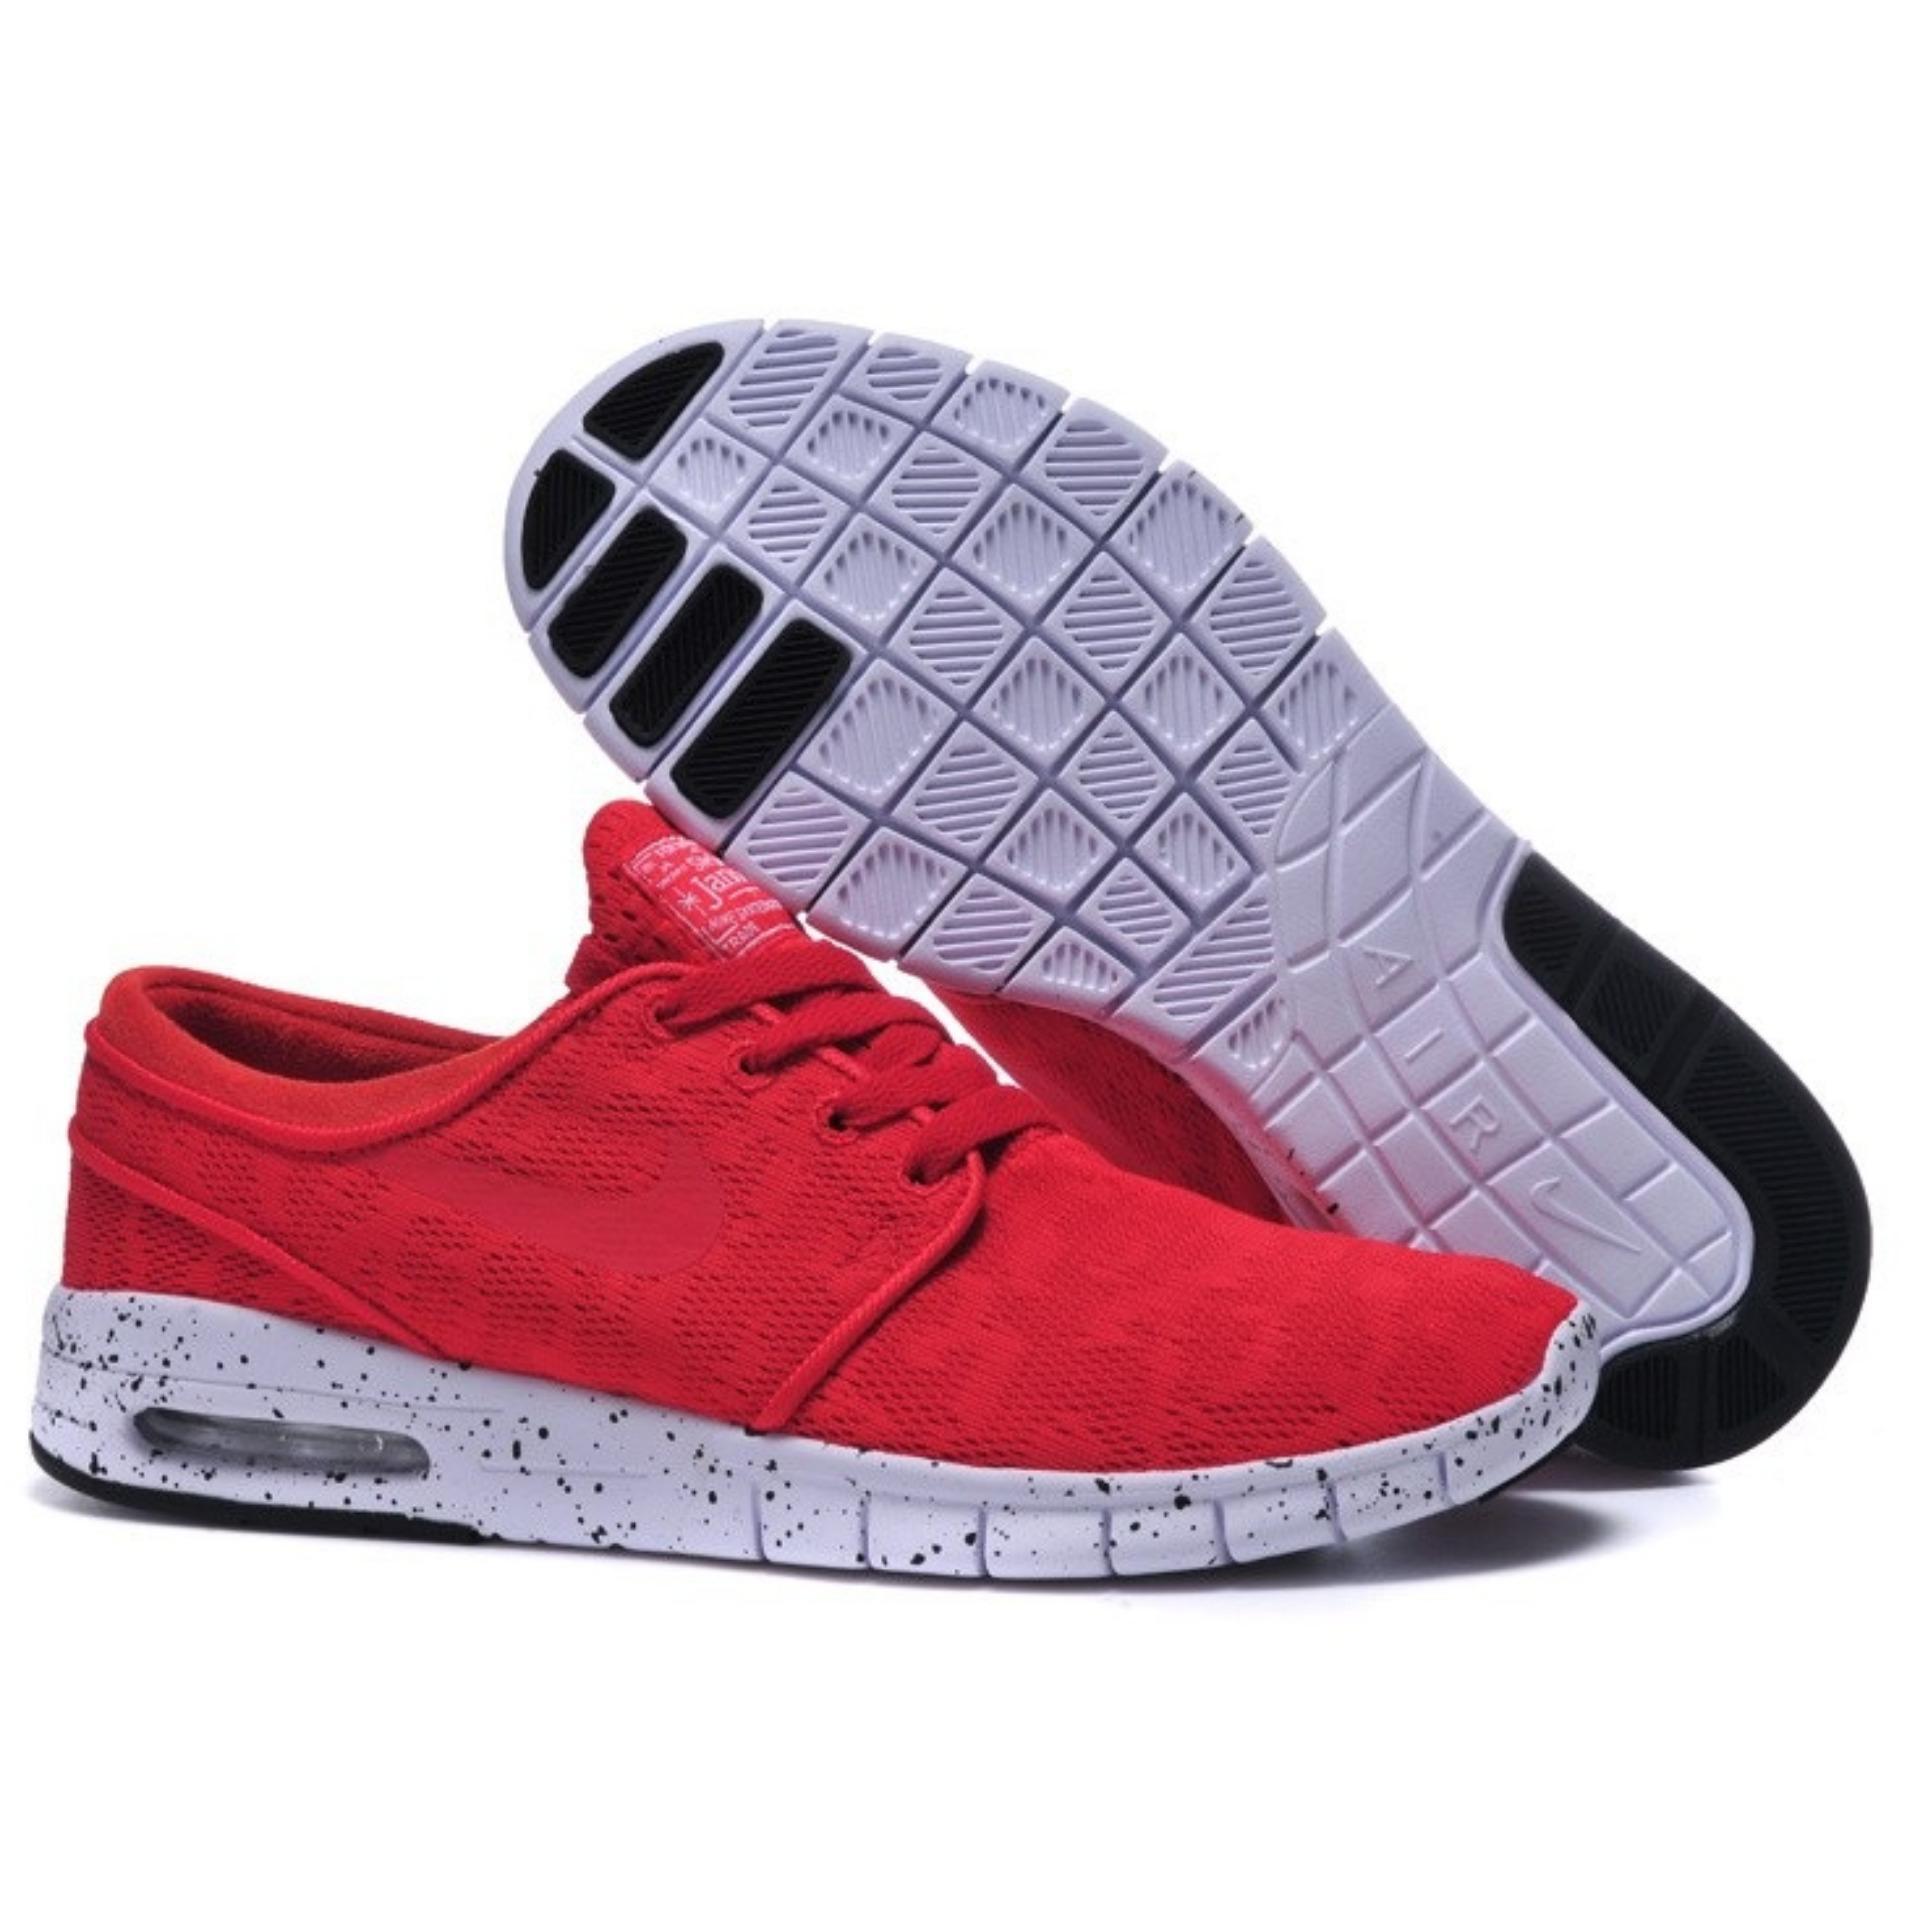 SB Stefan Janoski Max Running Shoes Women Size 36-40 Red - intl ...